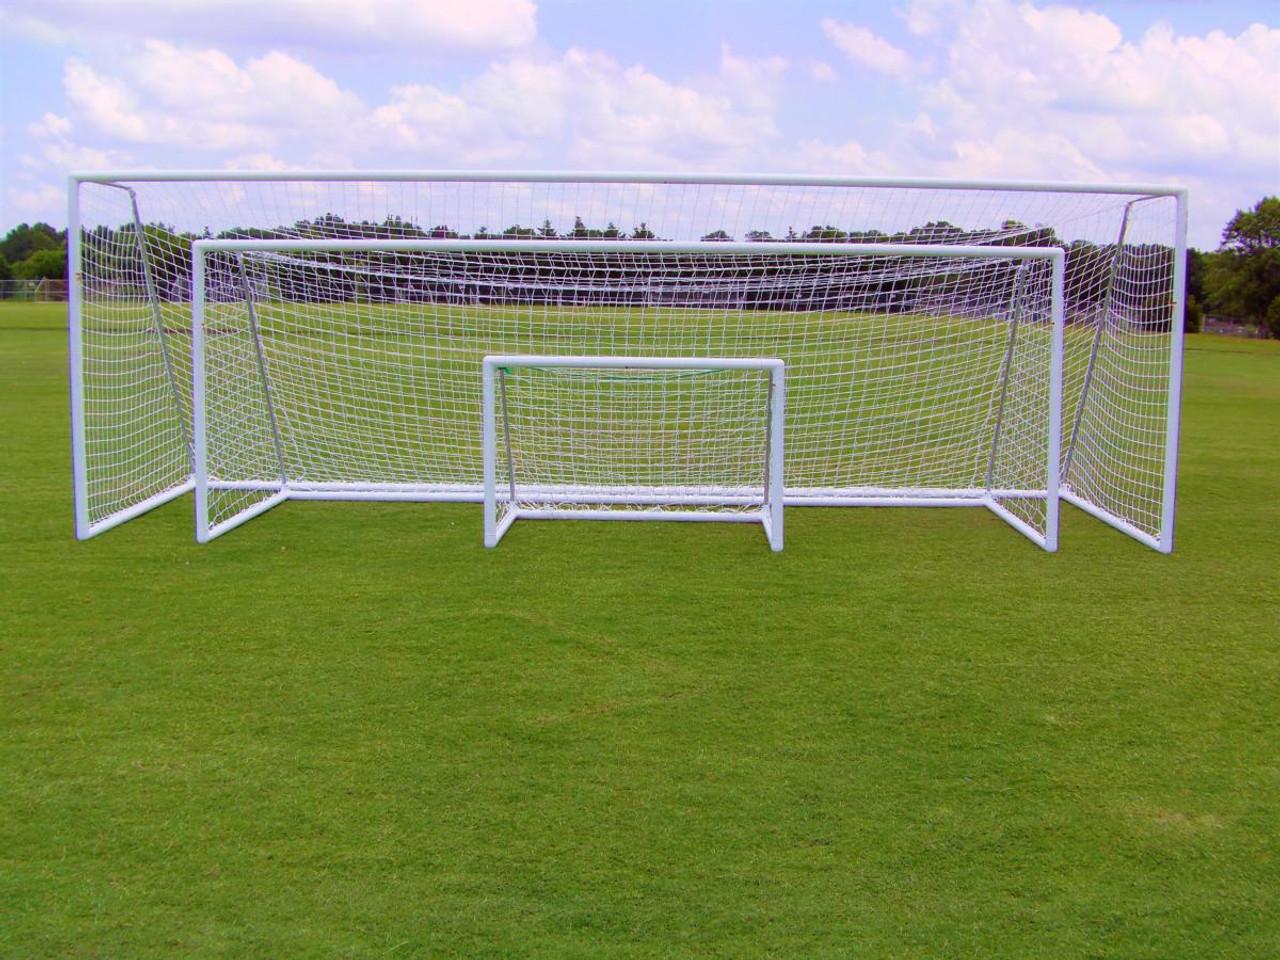 Pevo Soccer Goals Park Series 7' x 21'_5